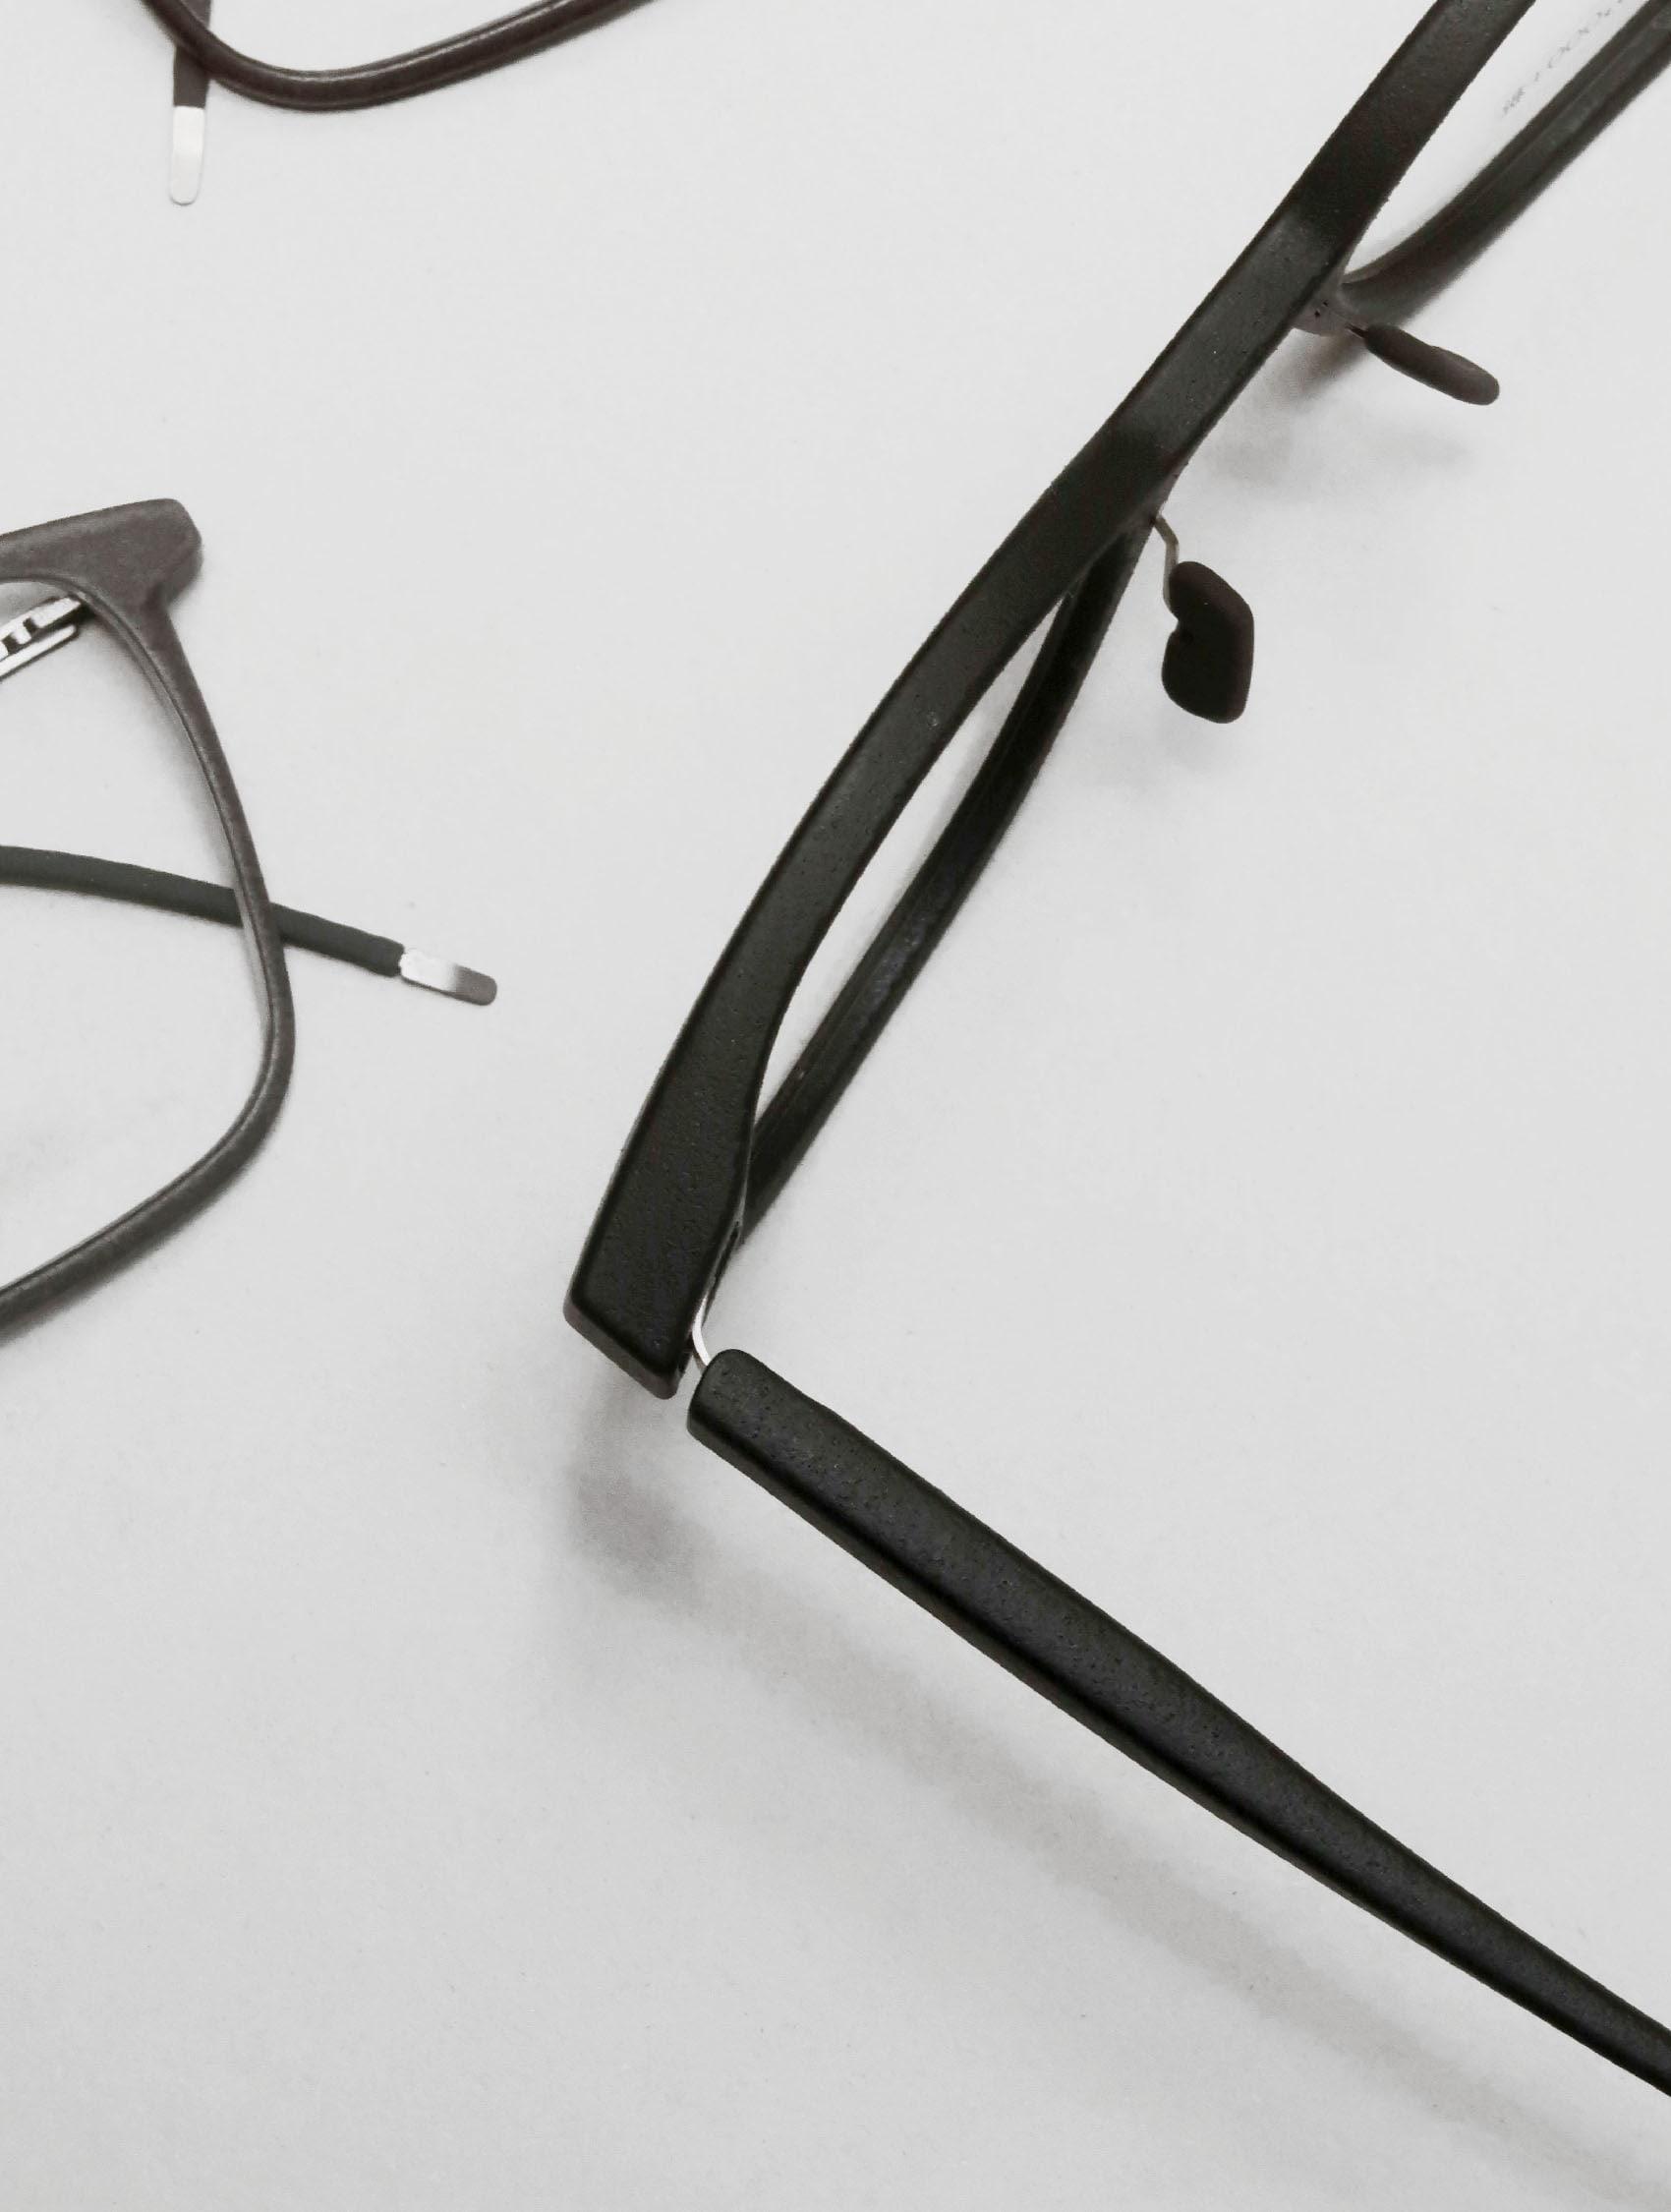 3DメガネのGÖTTI BOLD series 2